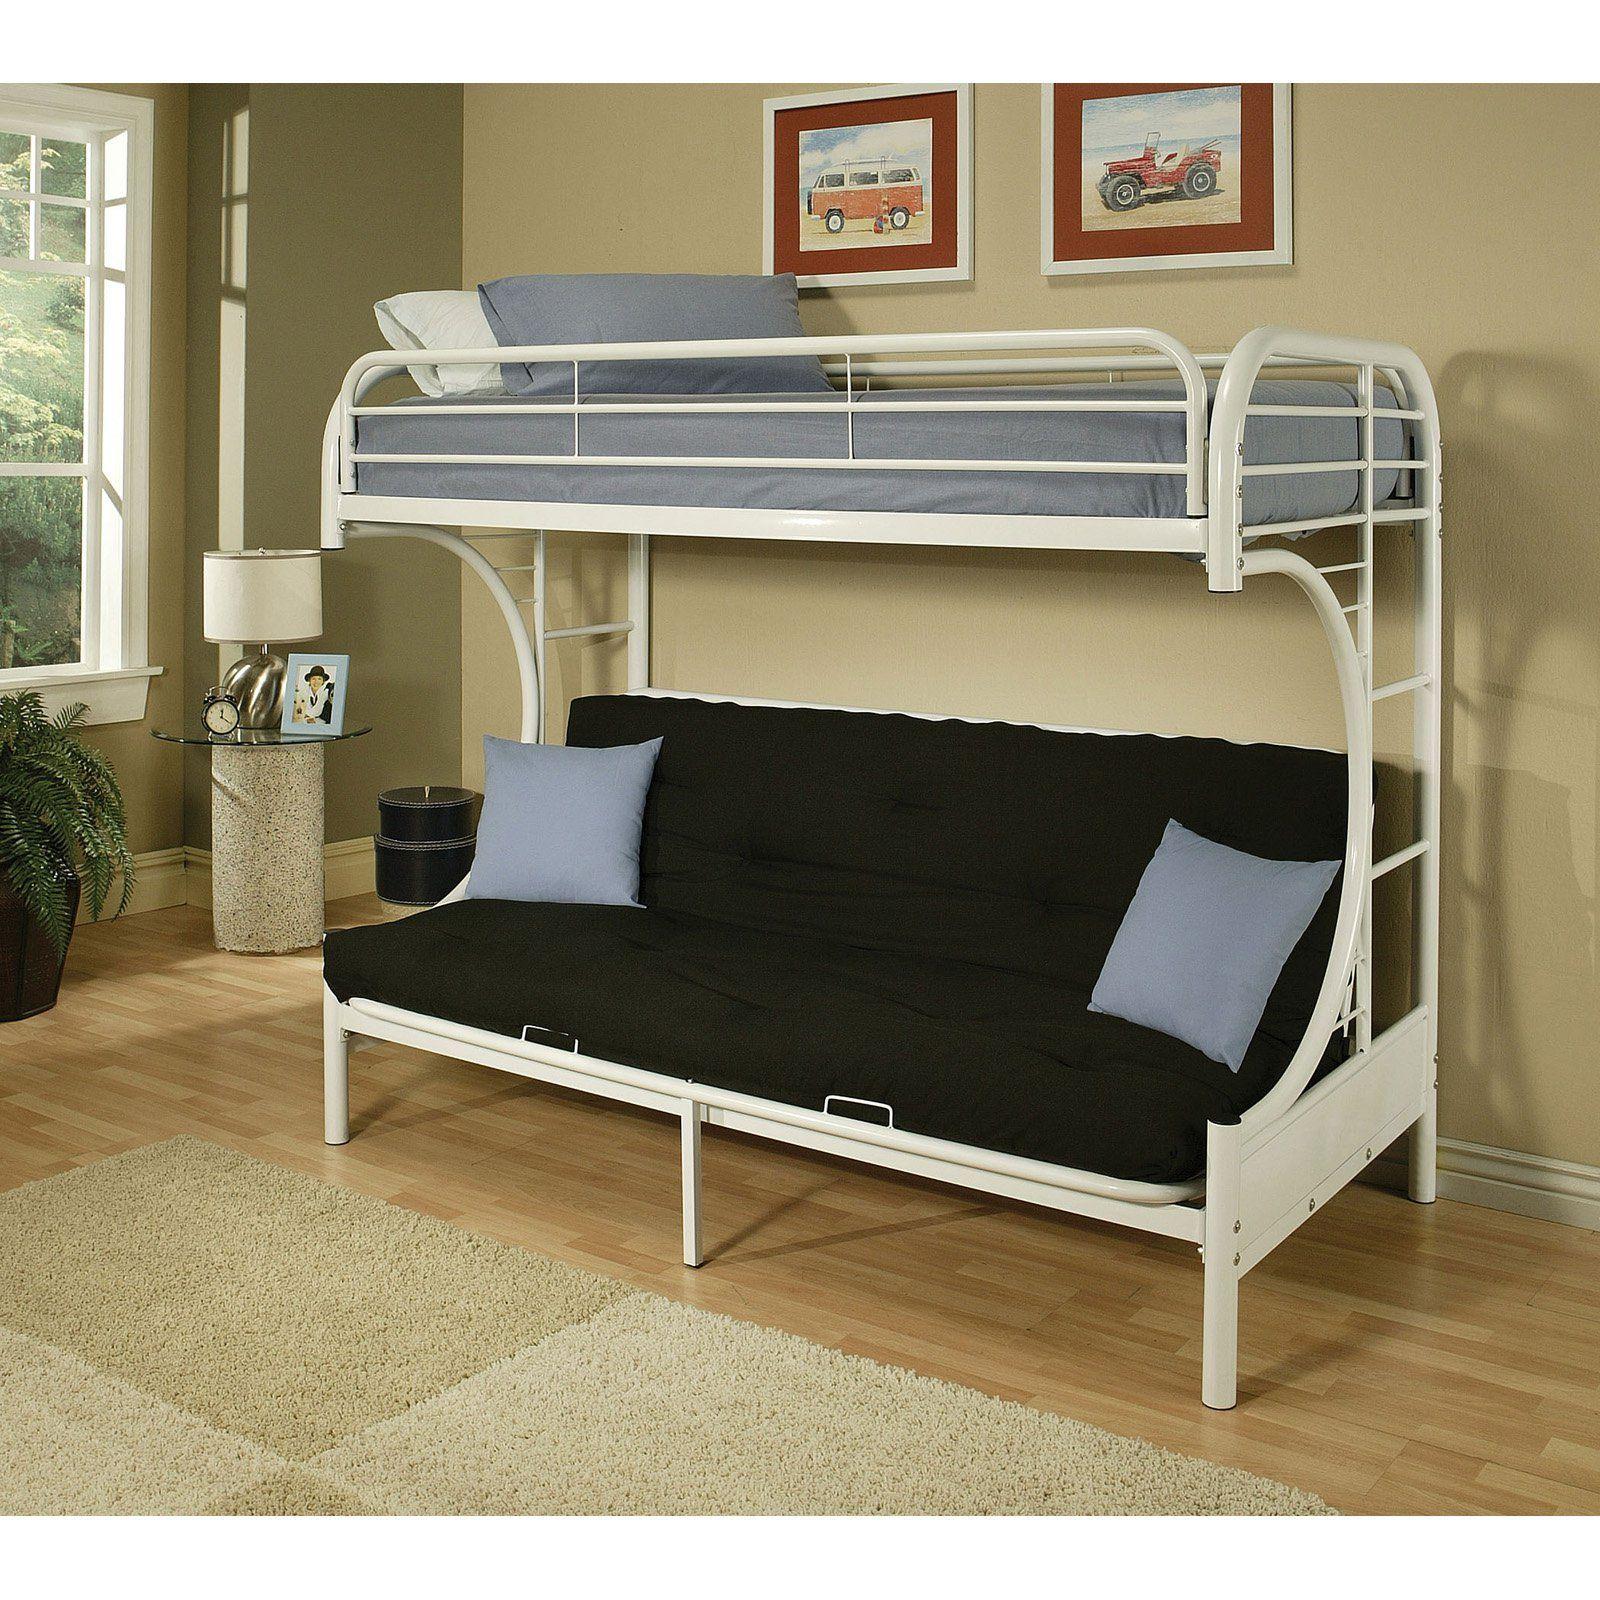 Acme Furniture Eclipse Twin Over Full Futon Bunk Bed Futon Bunk